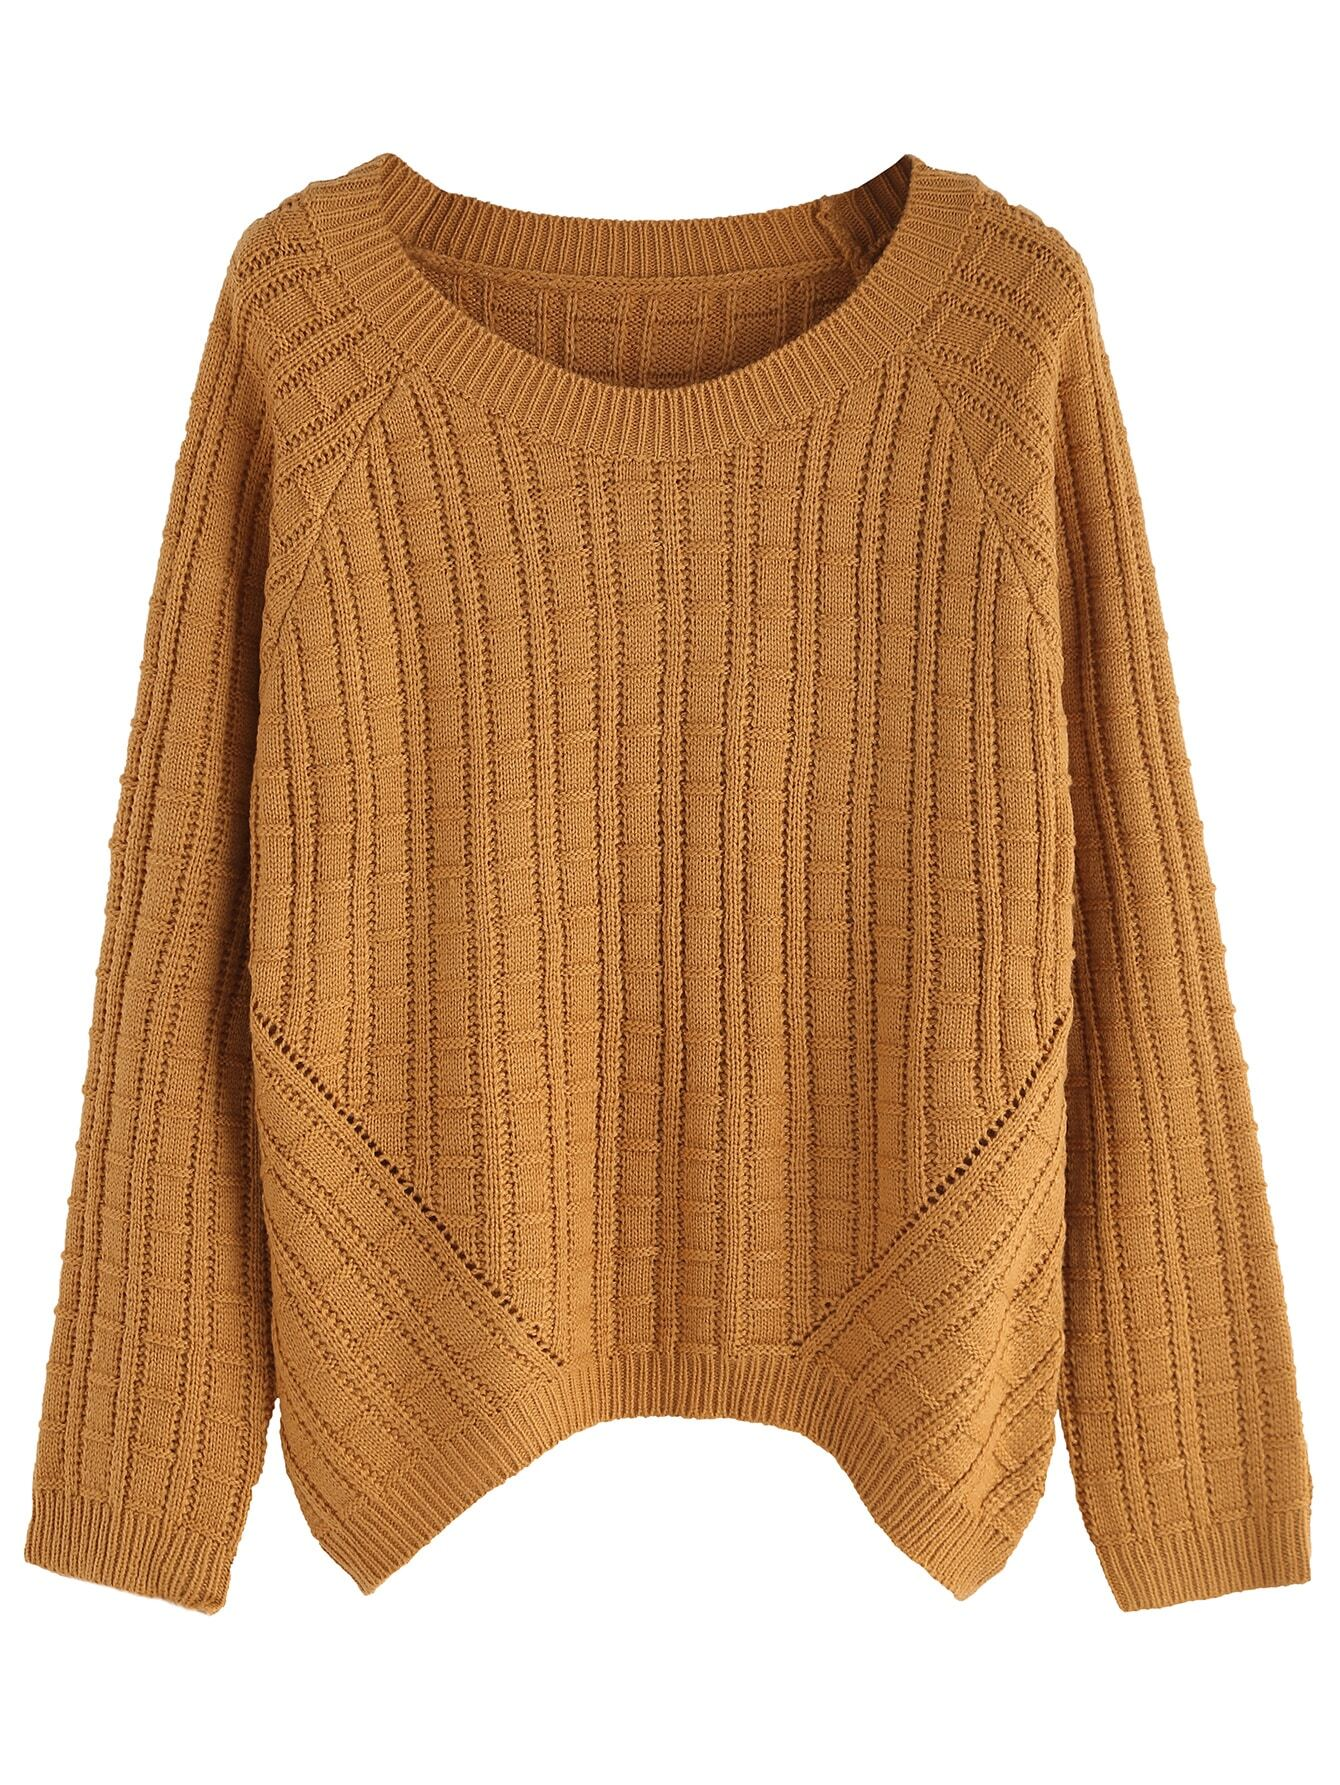 Khaki Ribbed Knit Raglan Sleeve Sweater sweater160915002